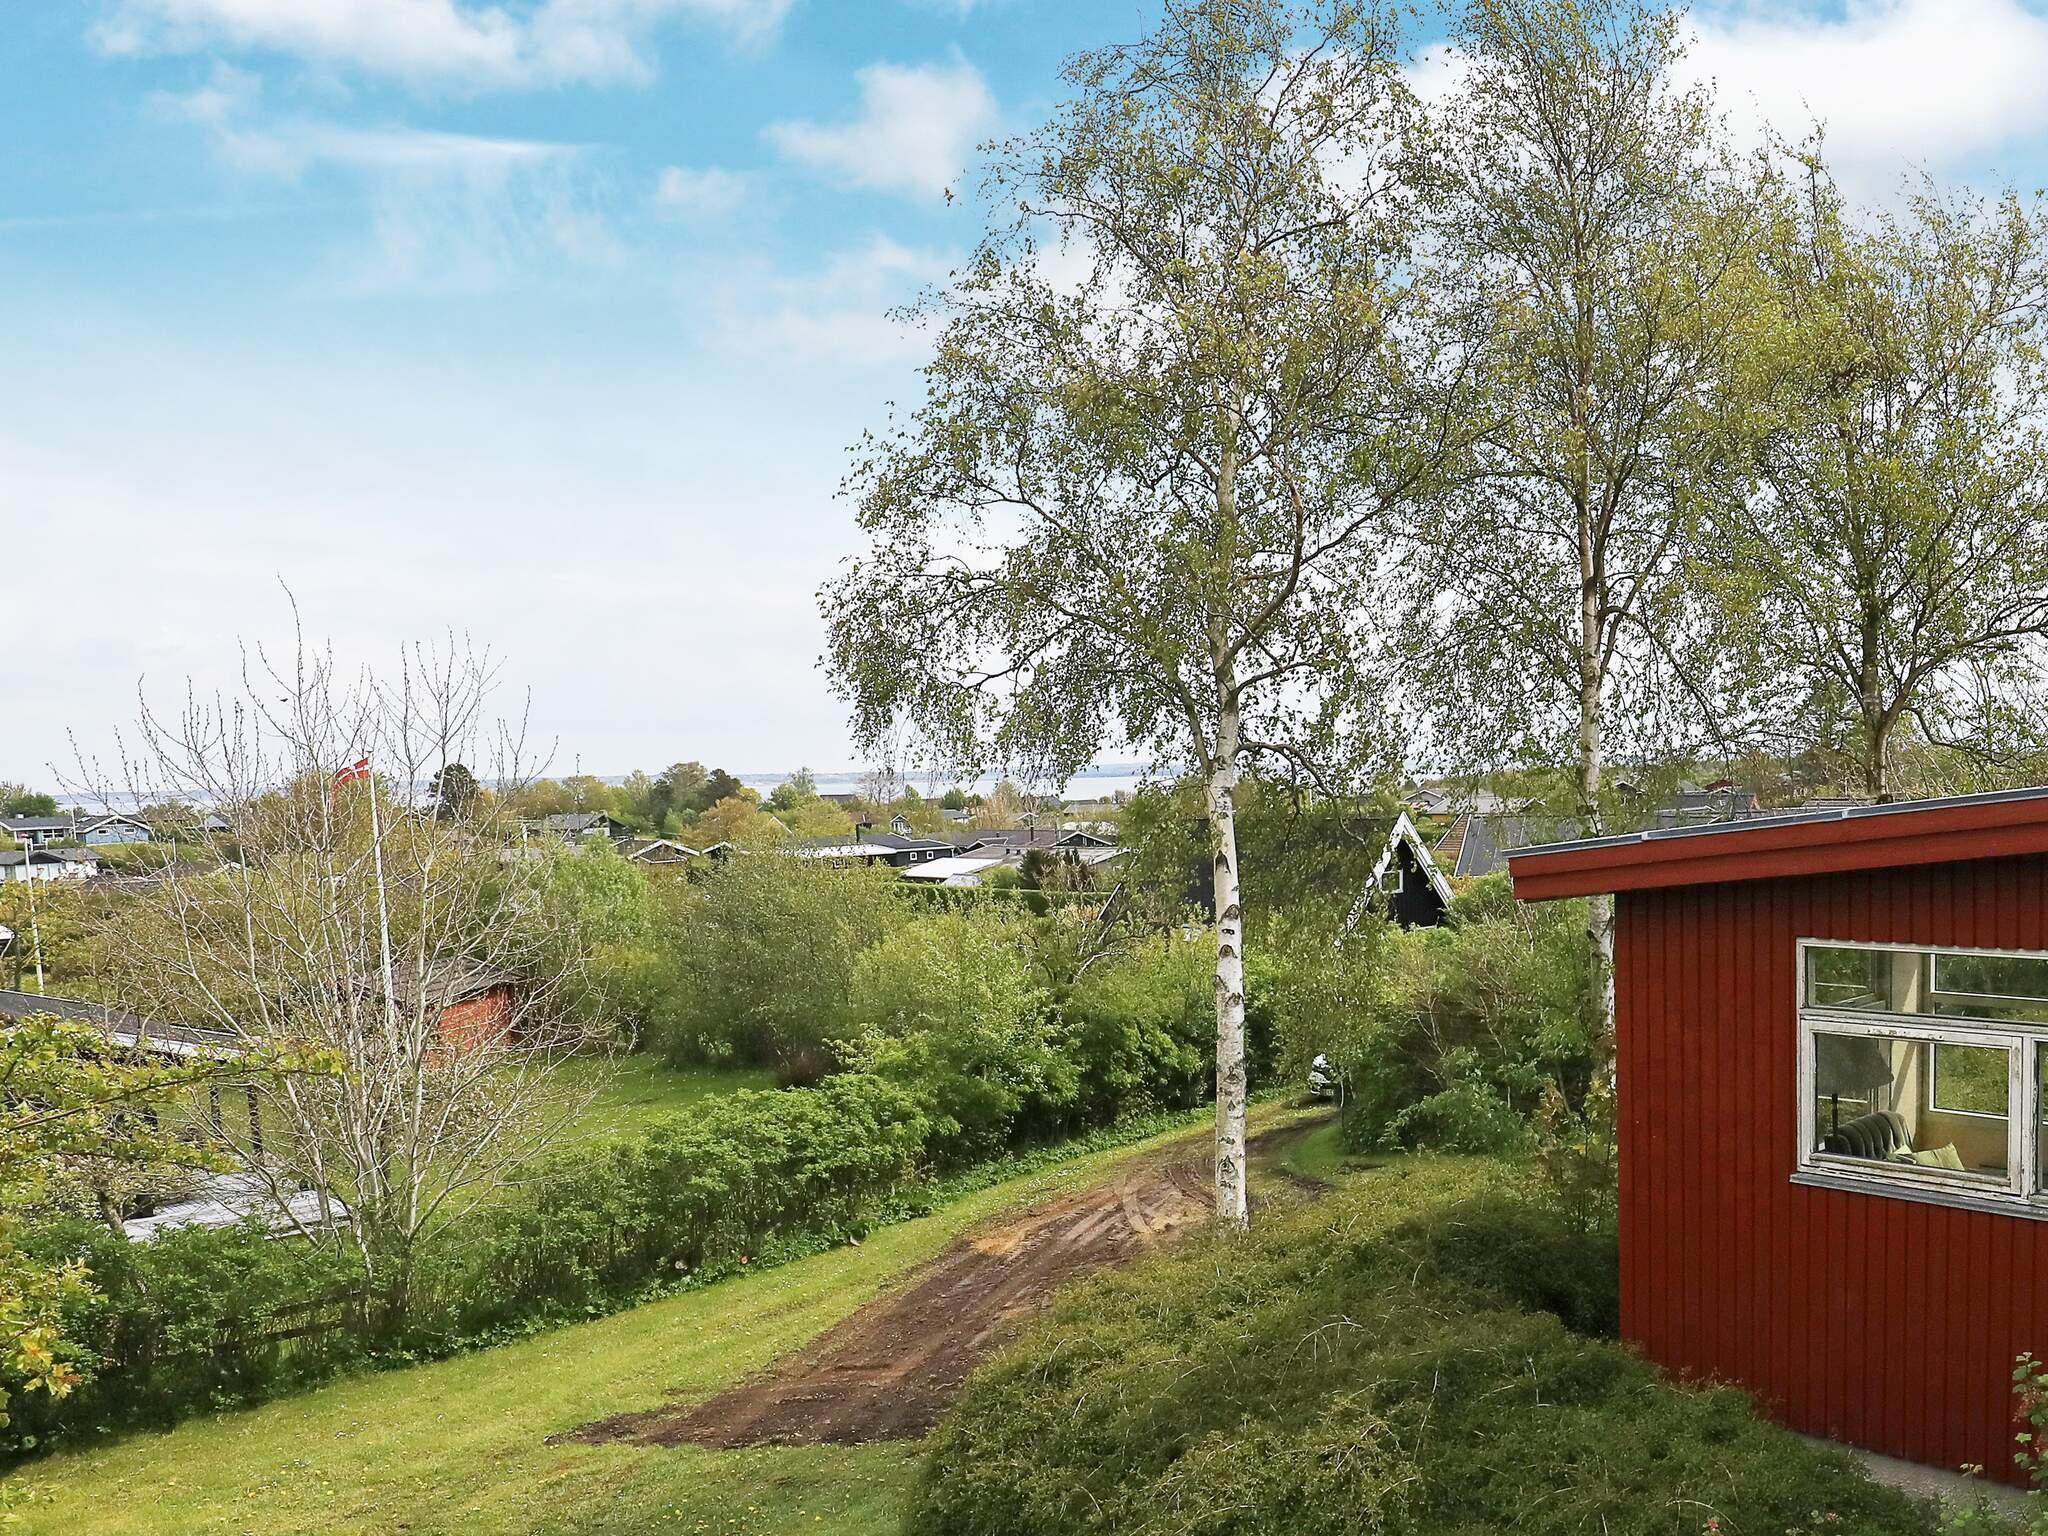 Ferienhaus Eskov Strandpark (83023), Roslev, , Limfjord, Dänemark, Bild 16